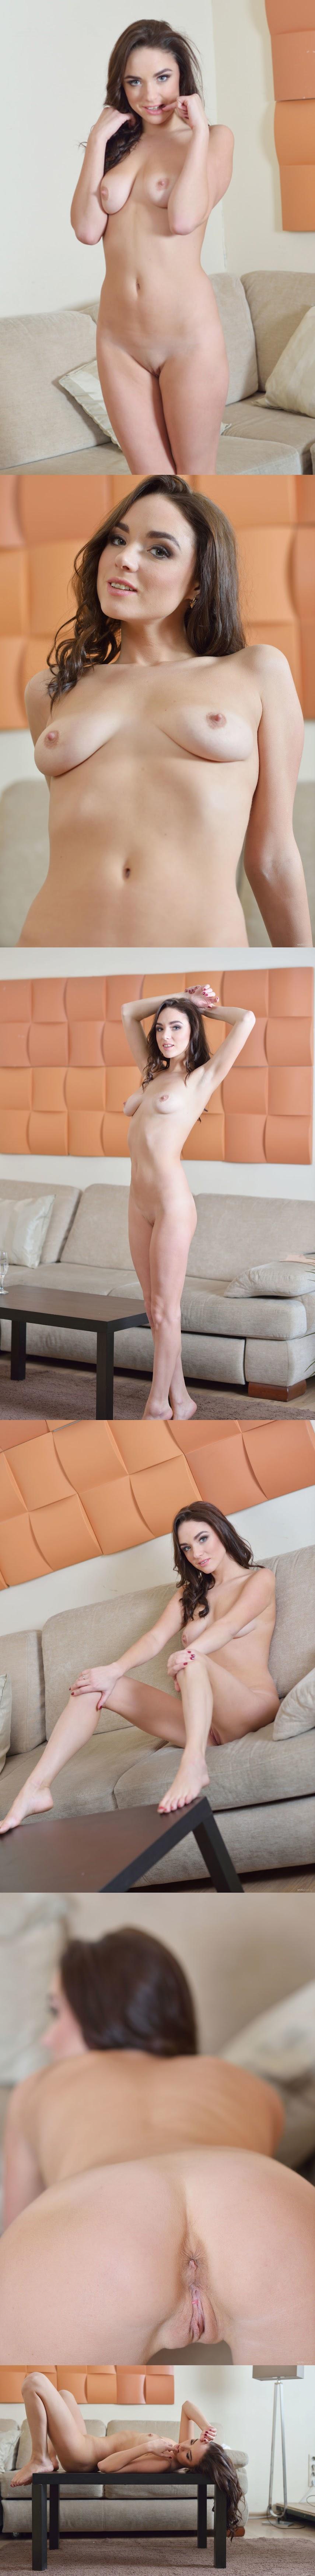 [EroticBeauty] Presenting Ronna